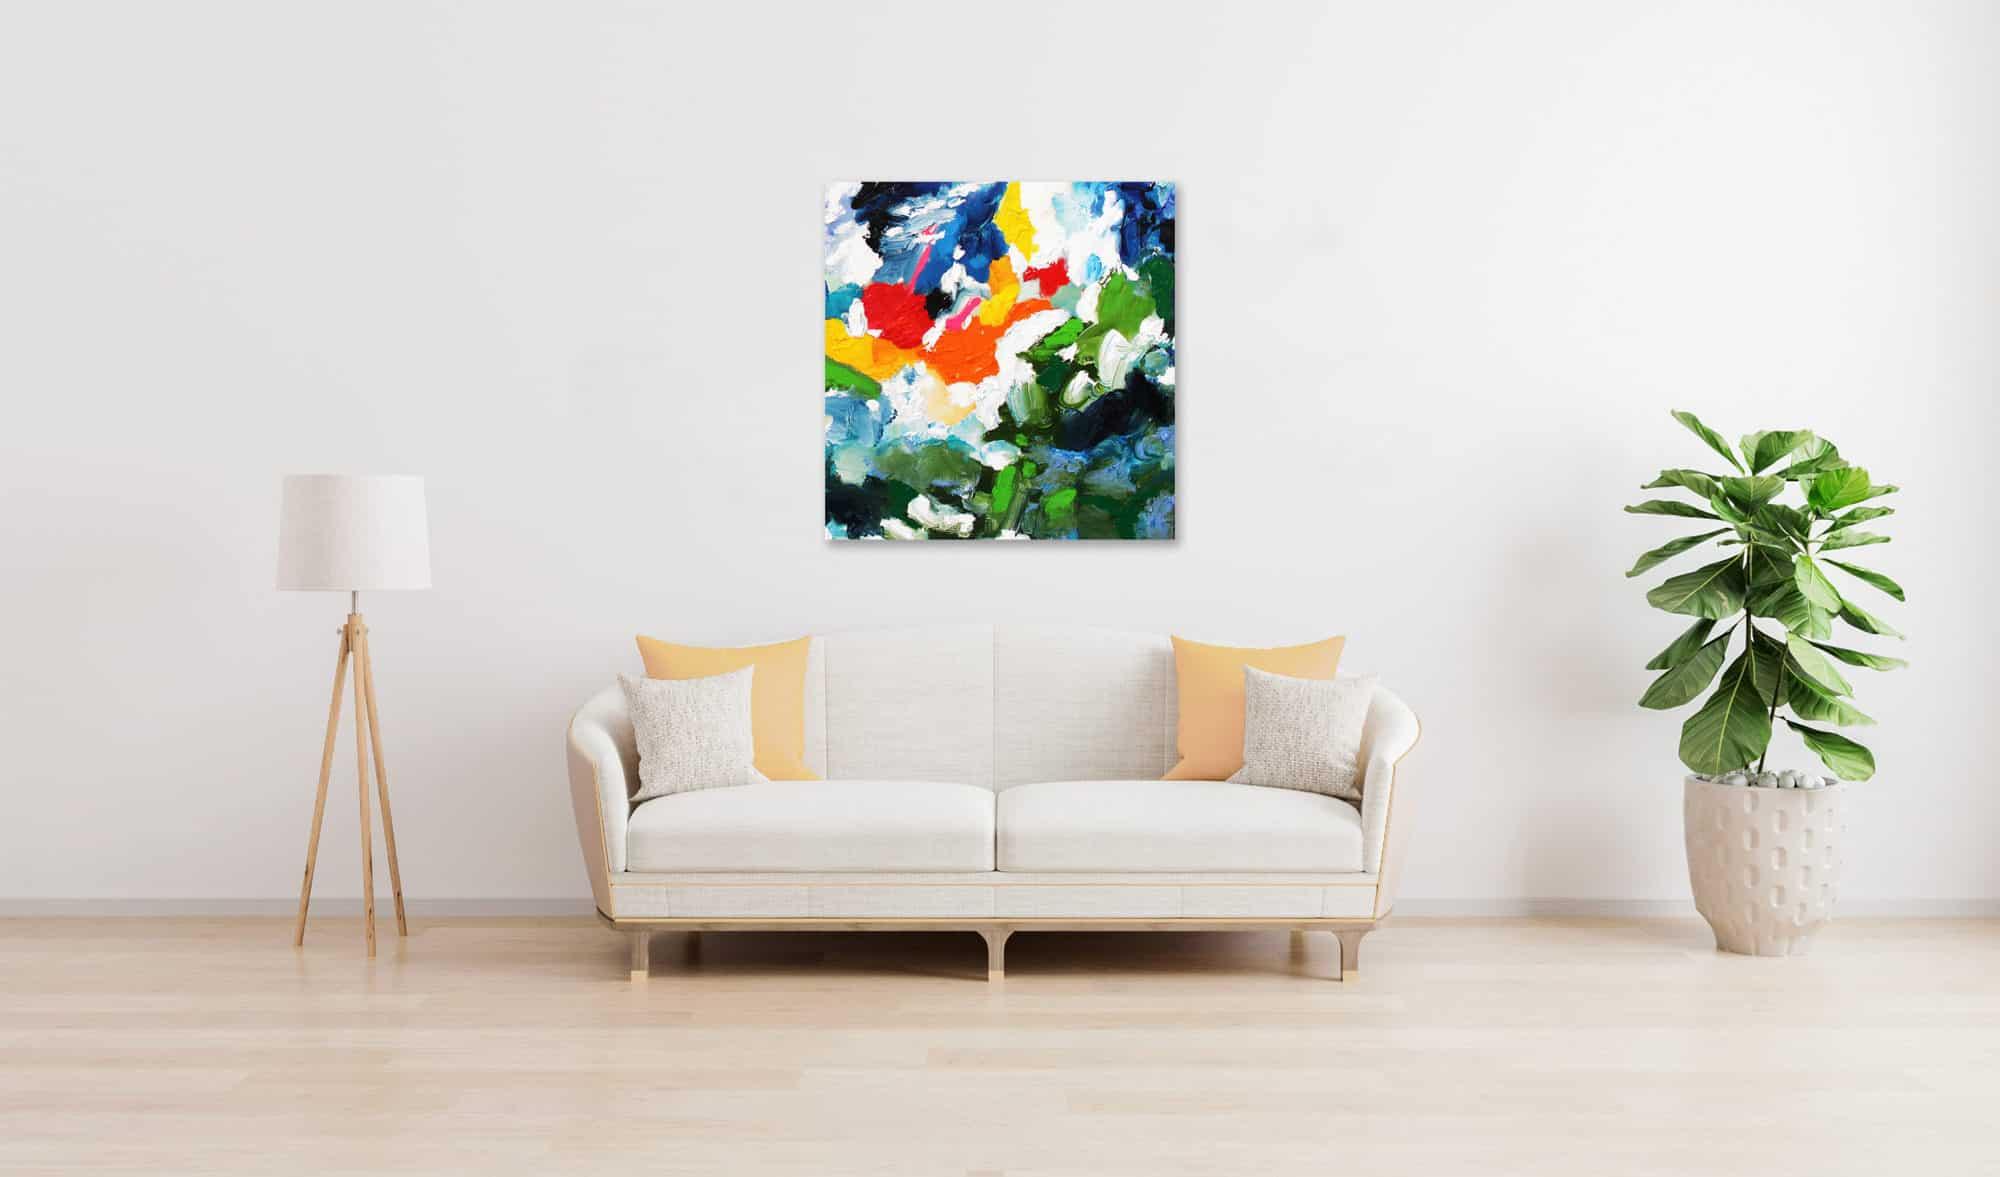 Acrylbild abstrakt expressiv stark farbig wandbild